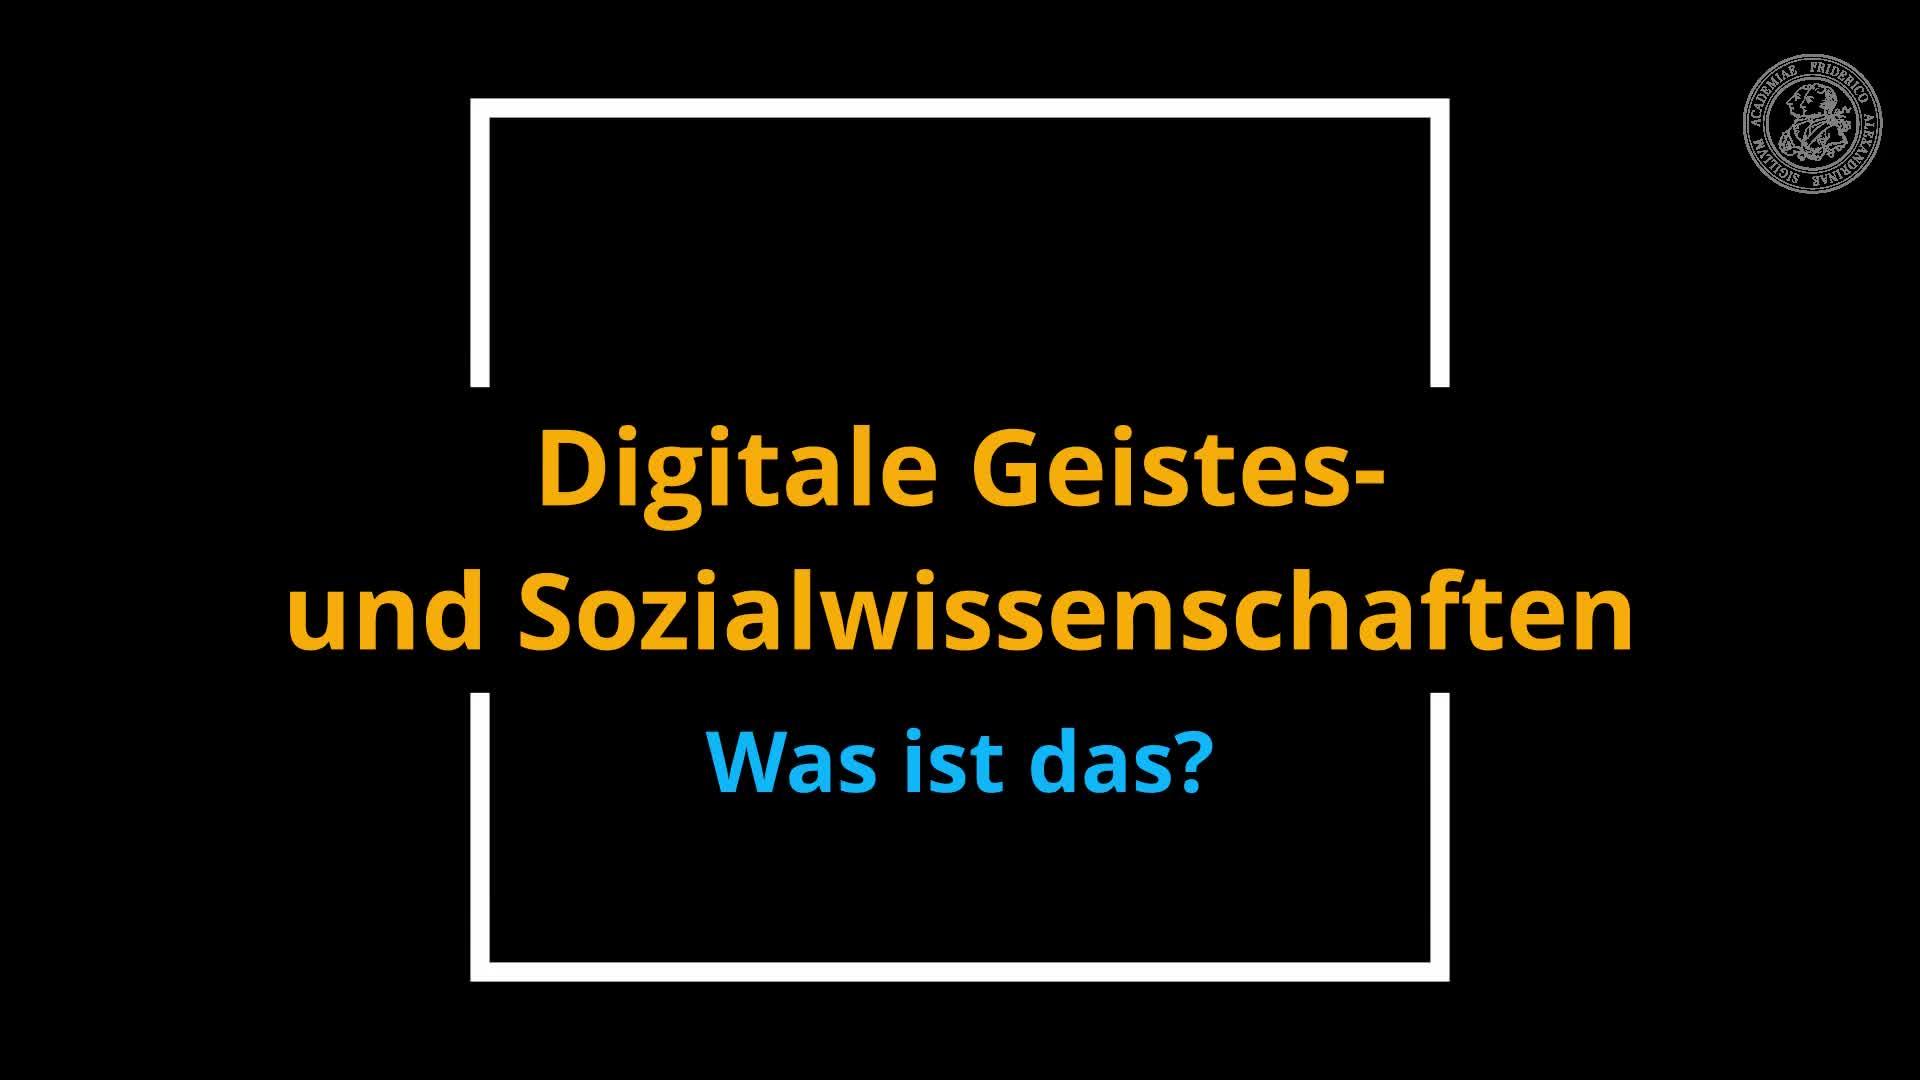 Studiengang Digitale Geistes- und Sozialwissenschaften preview image